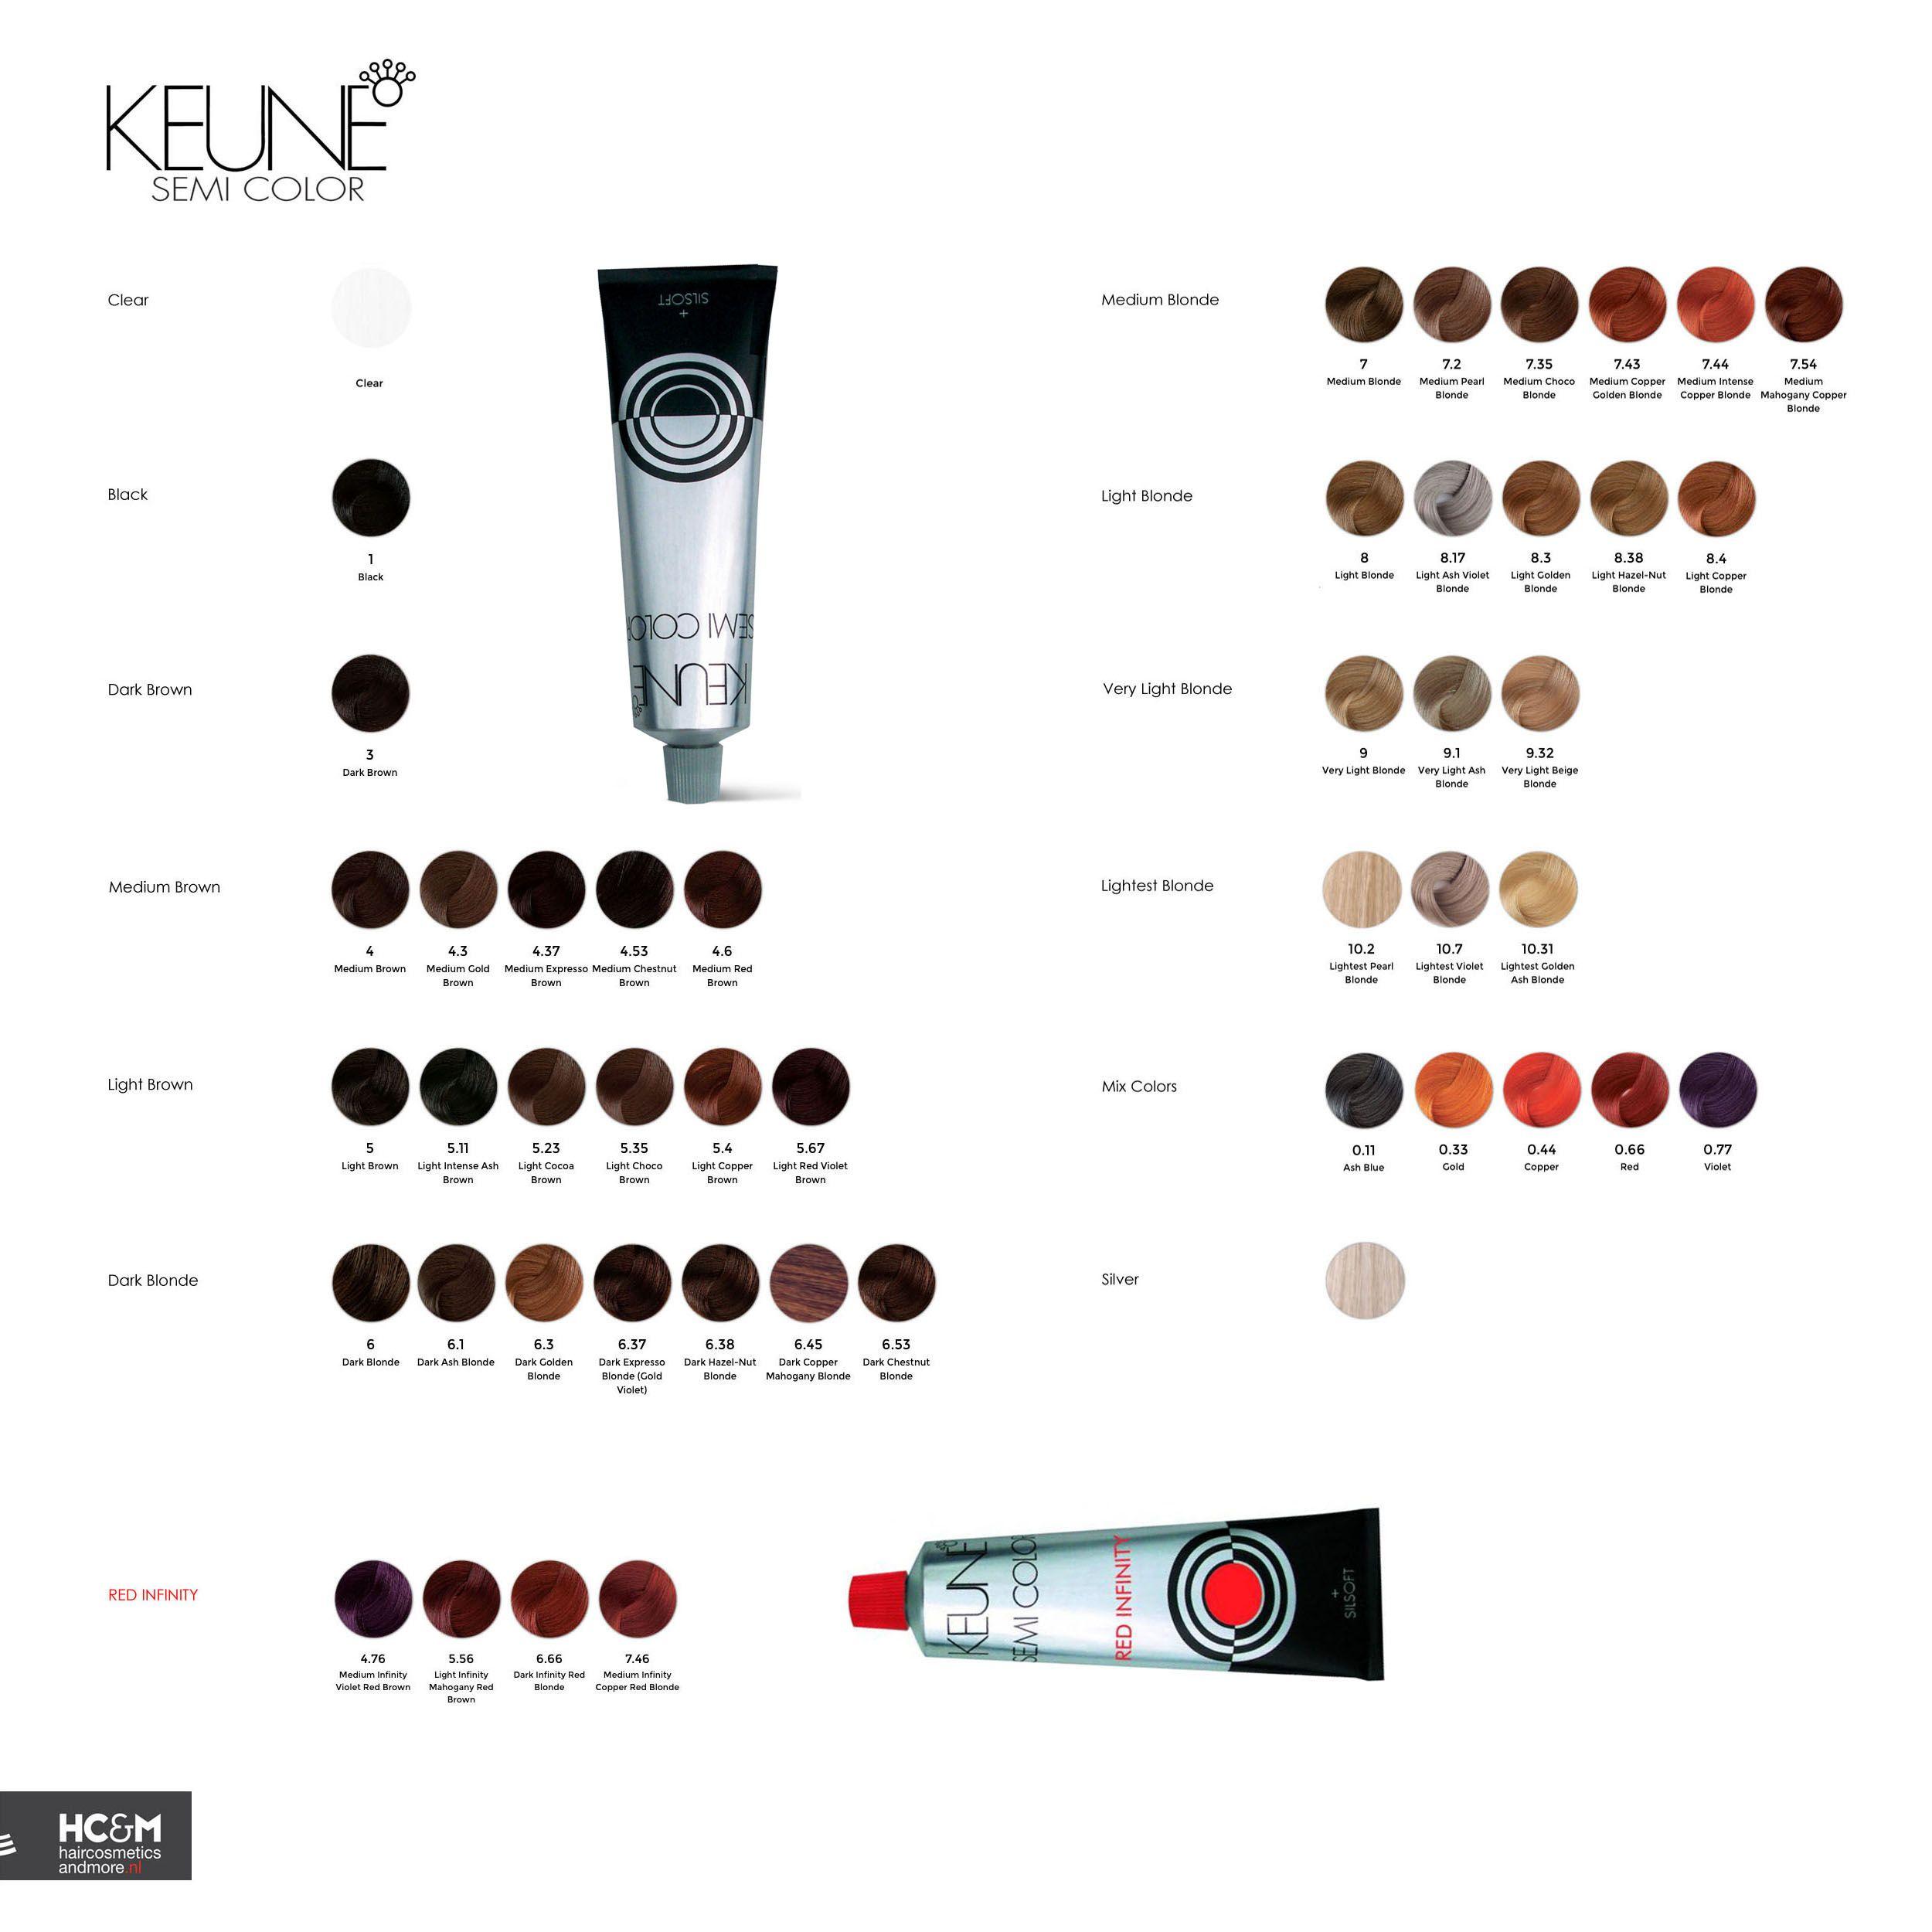 Keune Semi Color Shade Palette 2015 Hair Color Chart Hair Color Formulas Hair Color Swatches